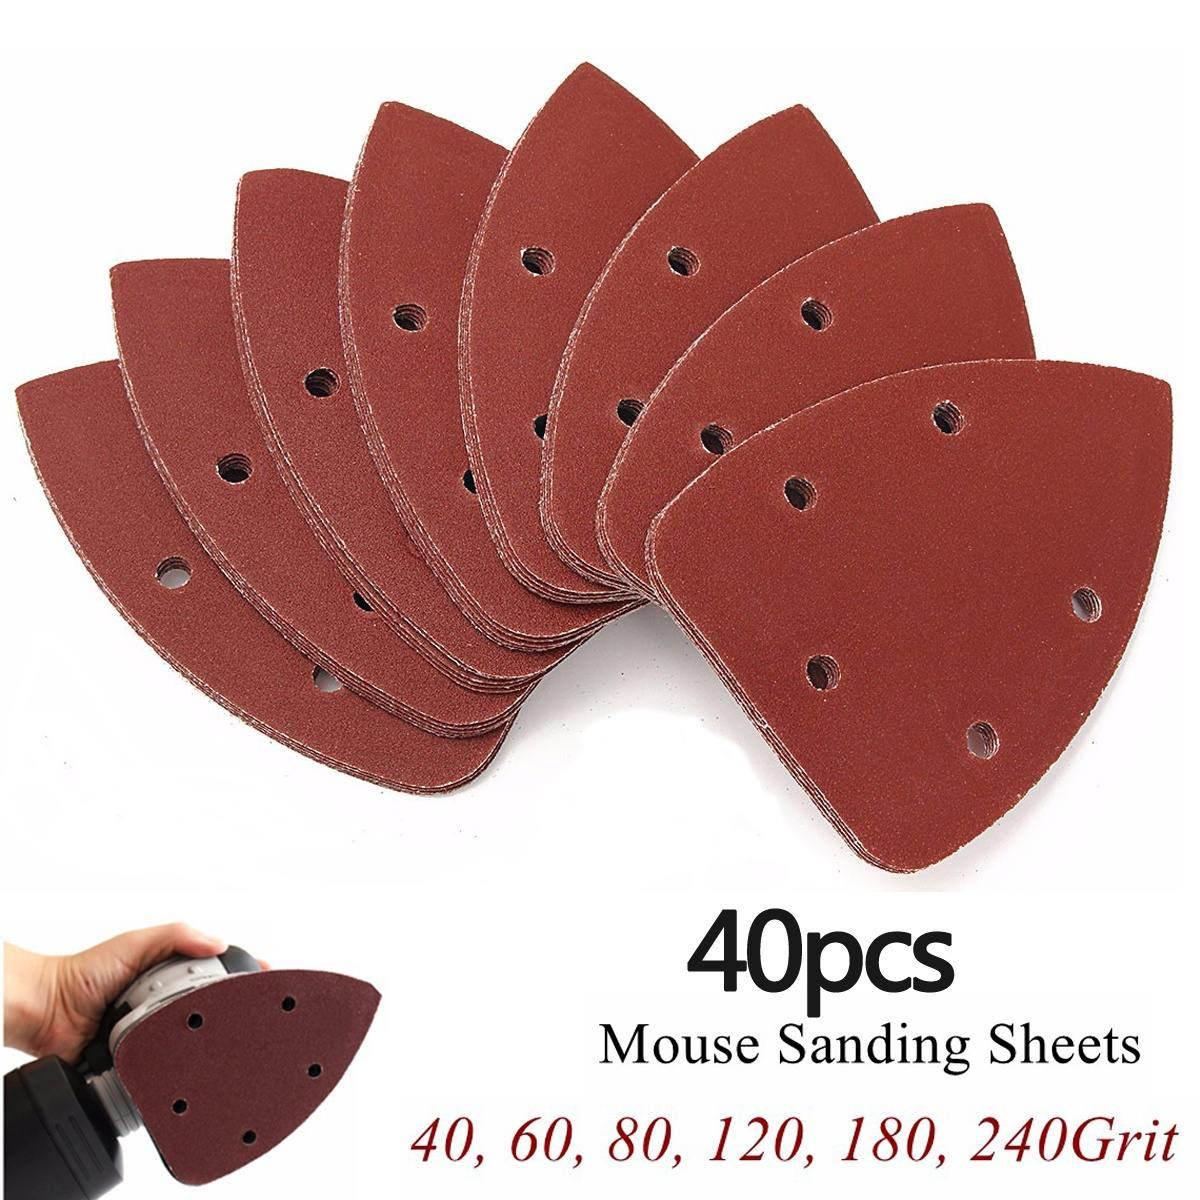 40pcs 140mmx90mm 40-240grit Mouse Sanding Sheets Paper Grinding Pad Polishing Disc Fit Black & Decker P Alm Sander